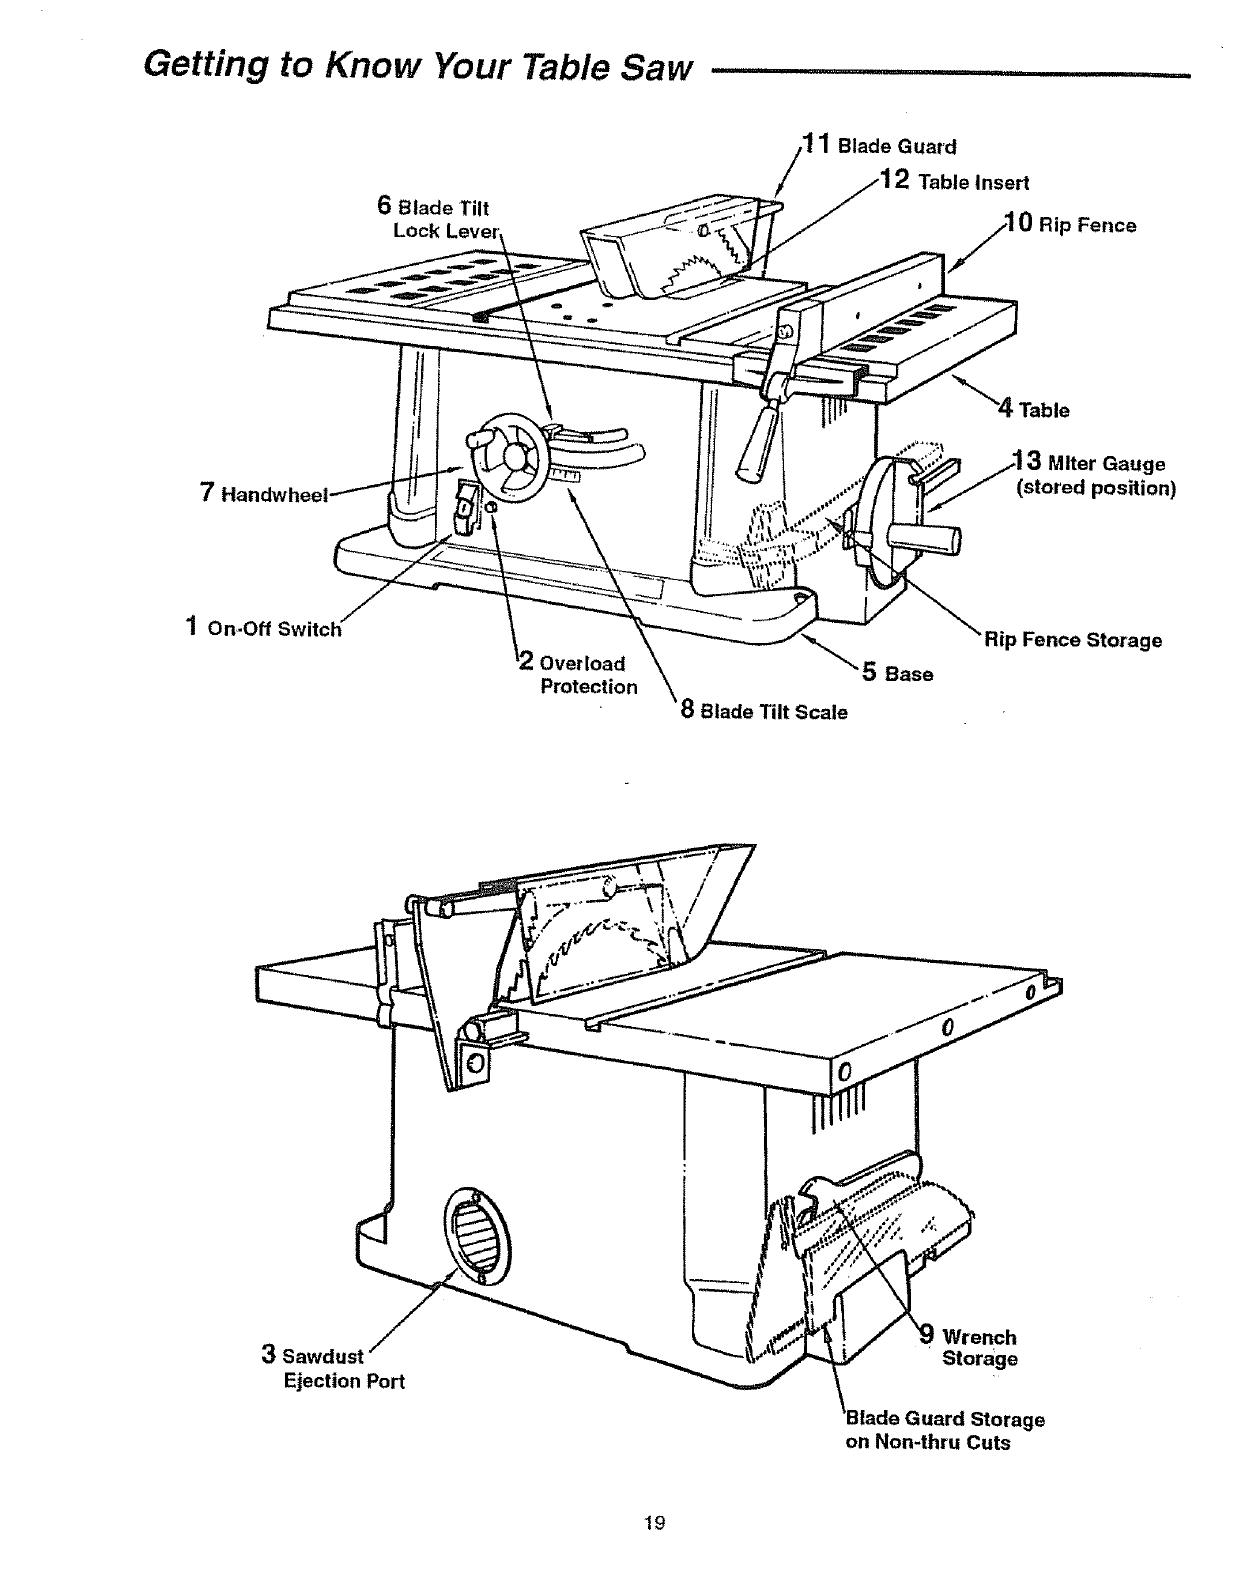 Craftsman 113221740 User Manual 10 BENCH TOP TABLE SAW